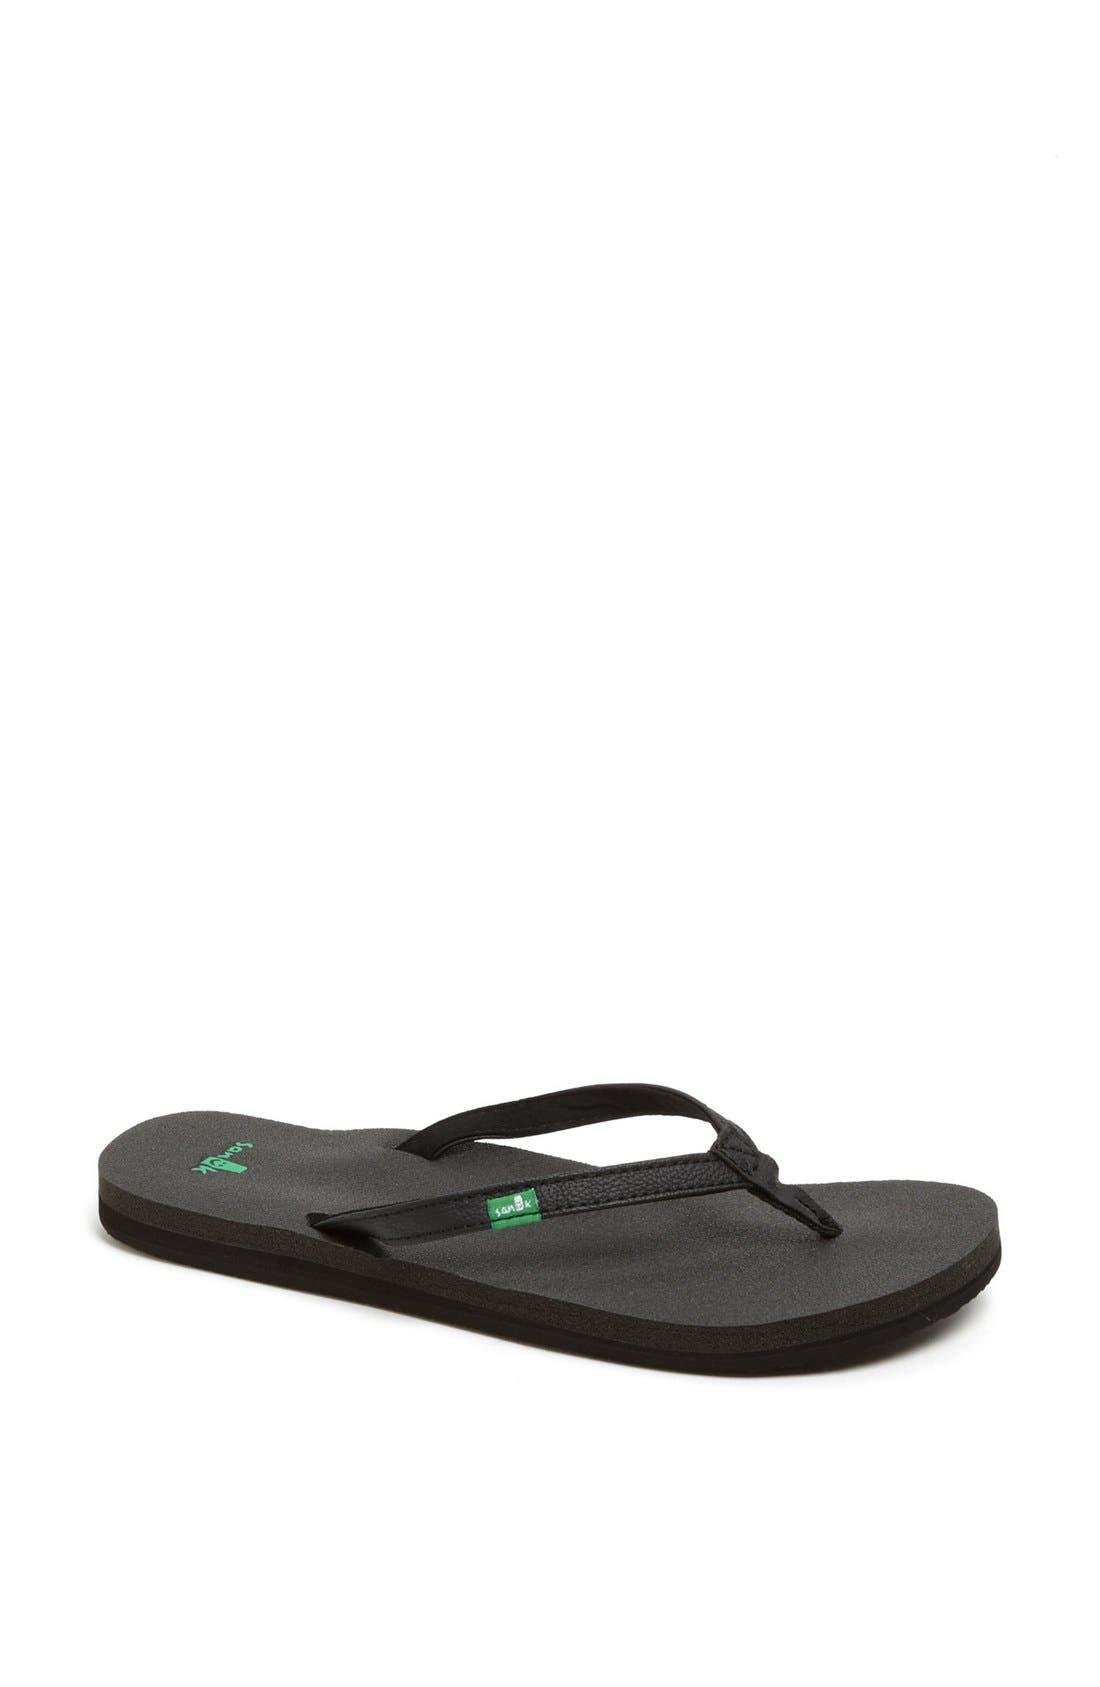 Sanuk 'Yoga Joy' Flip Flop (Women) (Regular Retail Price: $29.95)